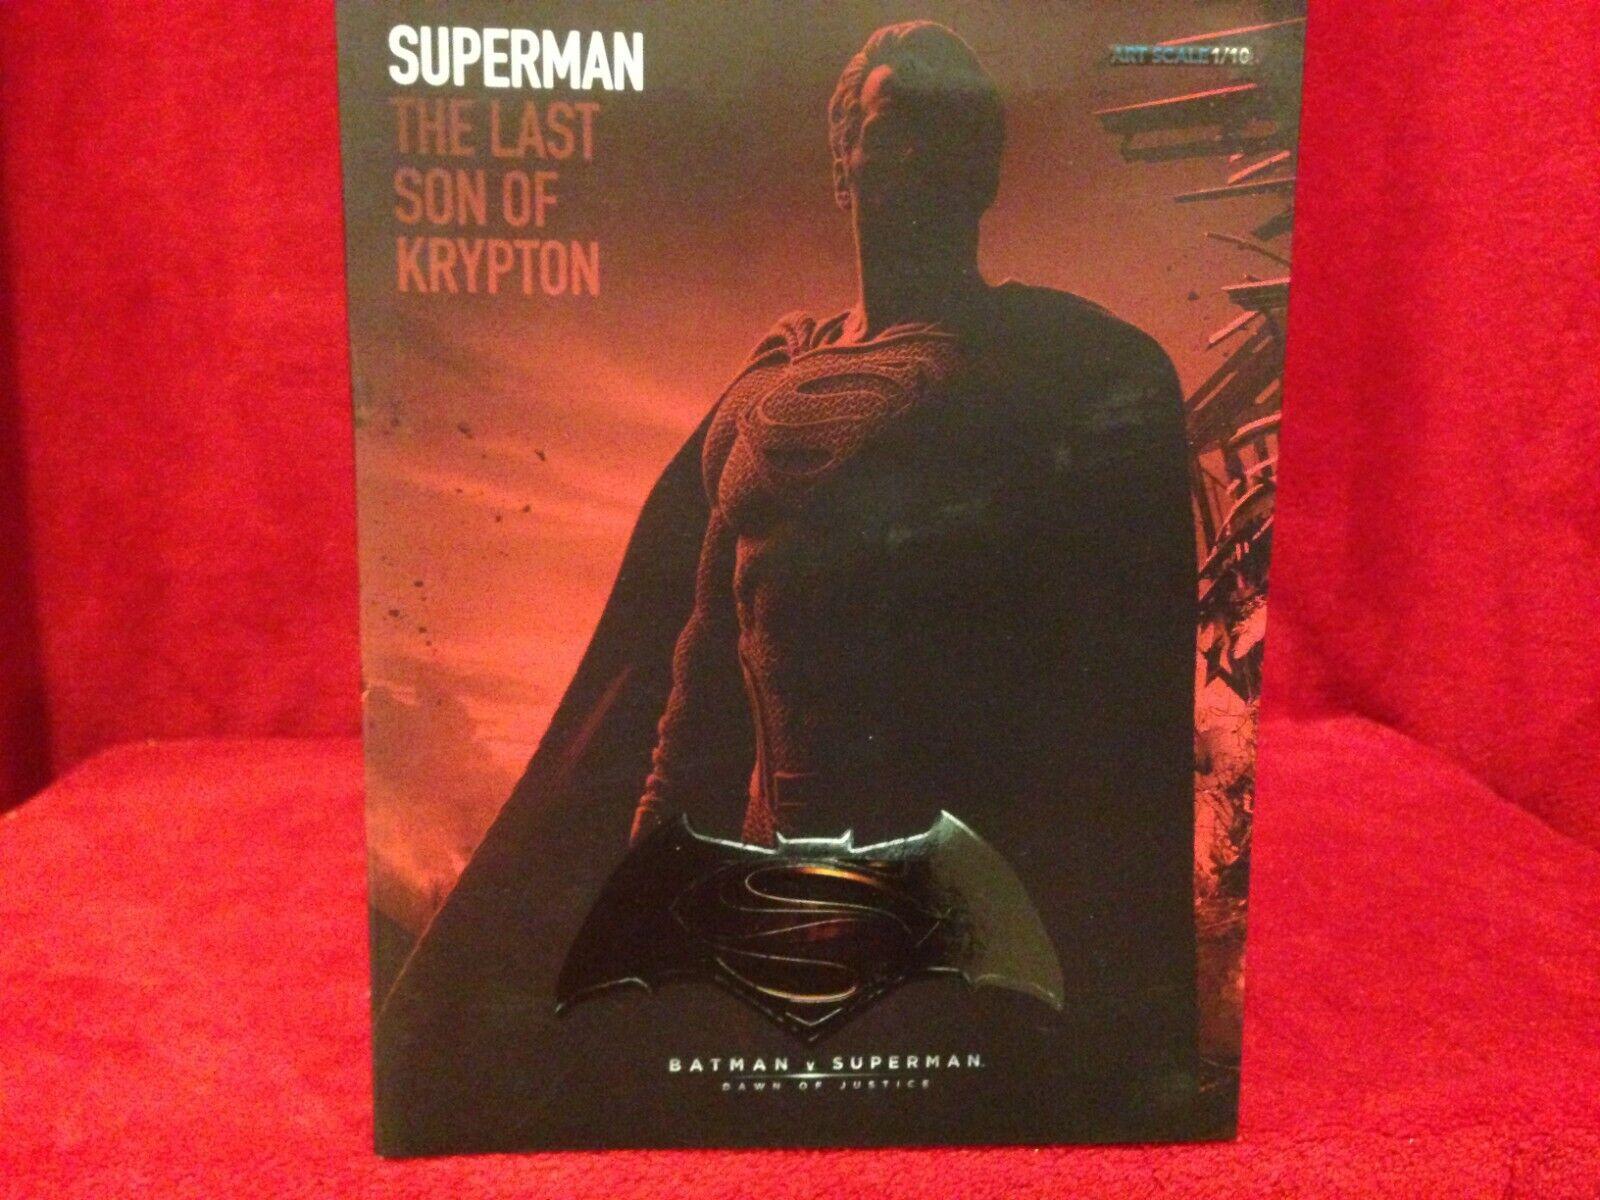 Superman Statue Iron Studios Batman vs Superman 1:10 Scale / BRAND NEW on eBay thumbnail